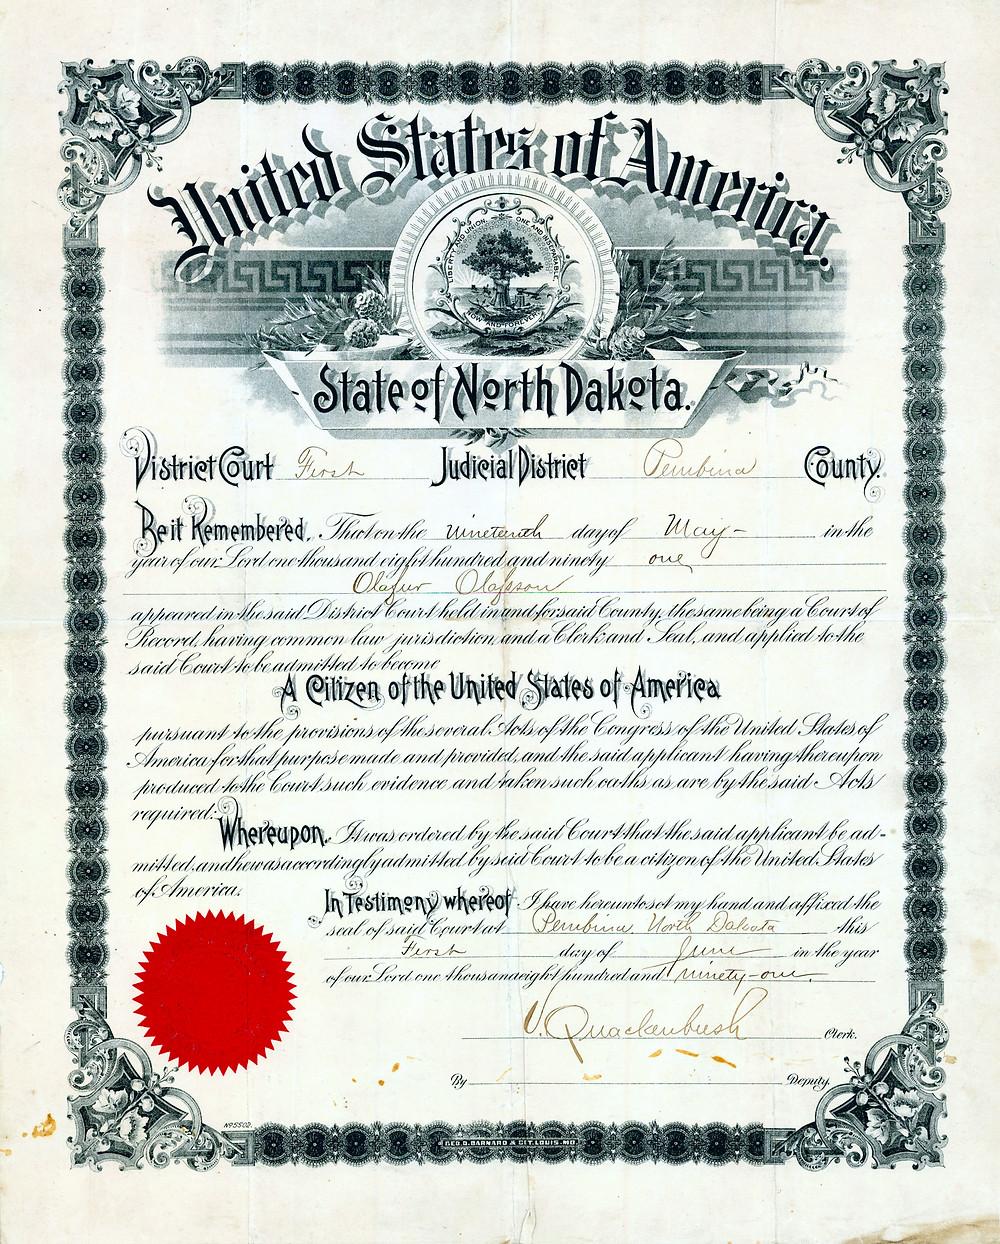 Ólafur Ólafsson Citizenship Paper